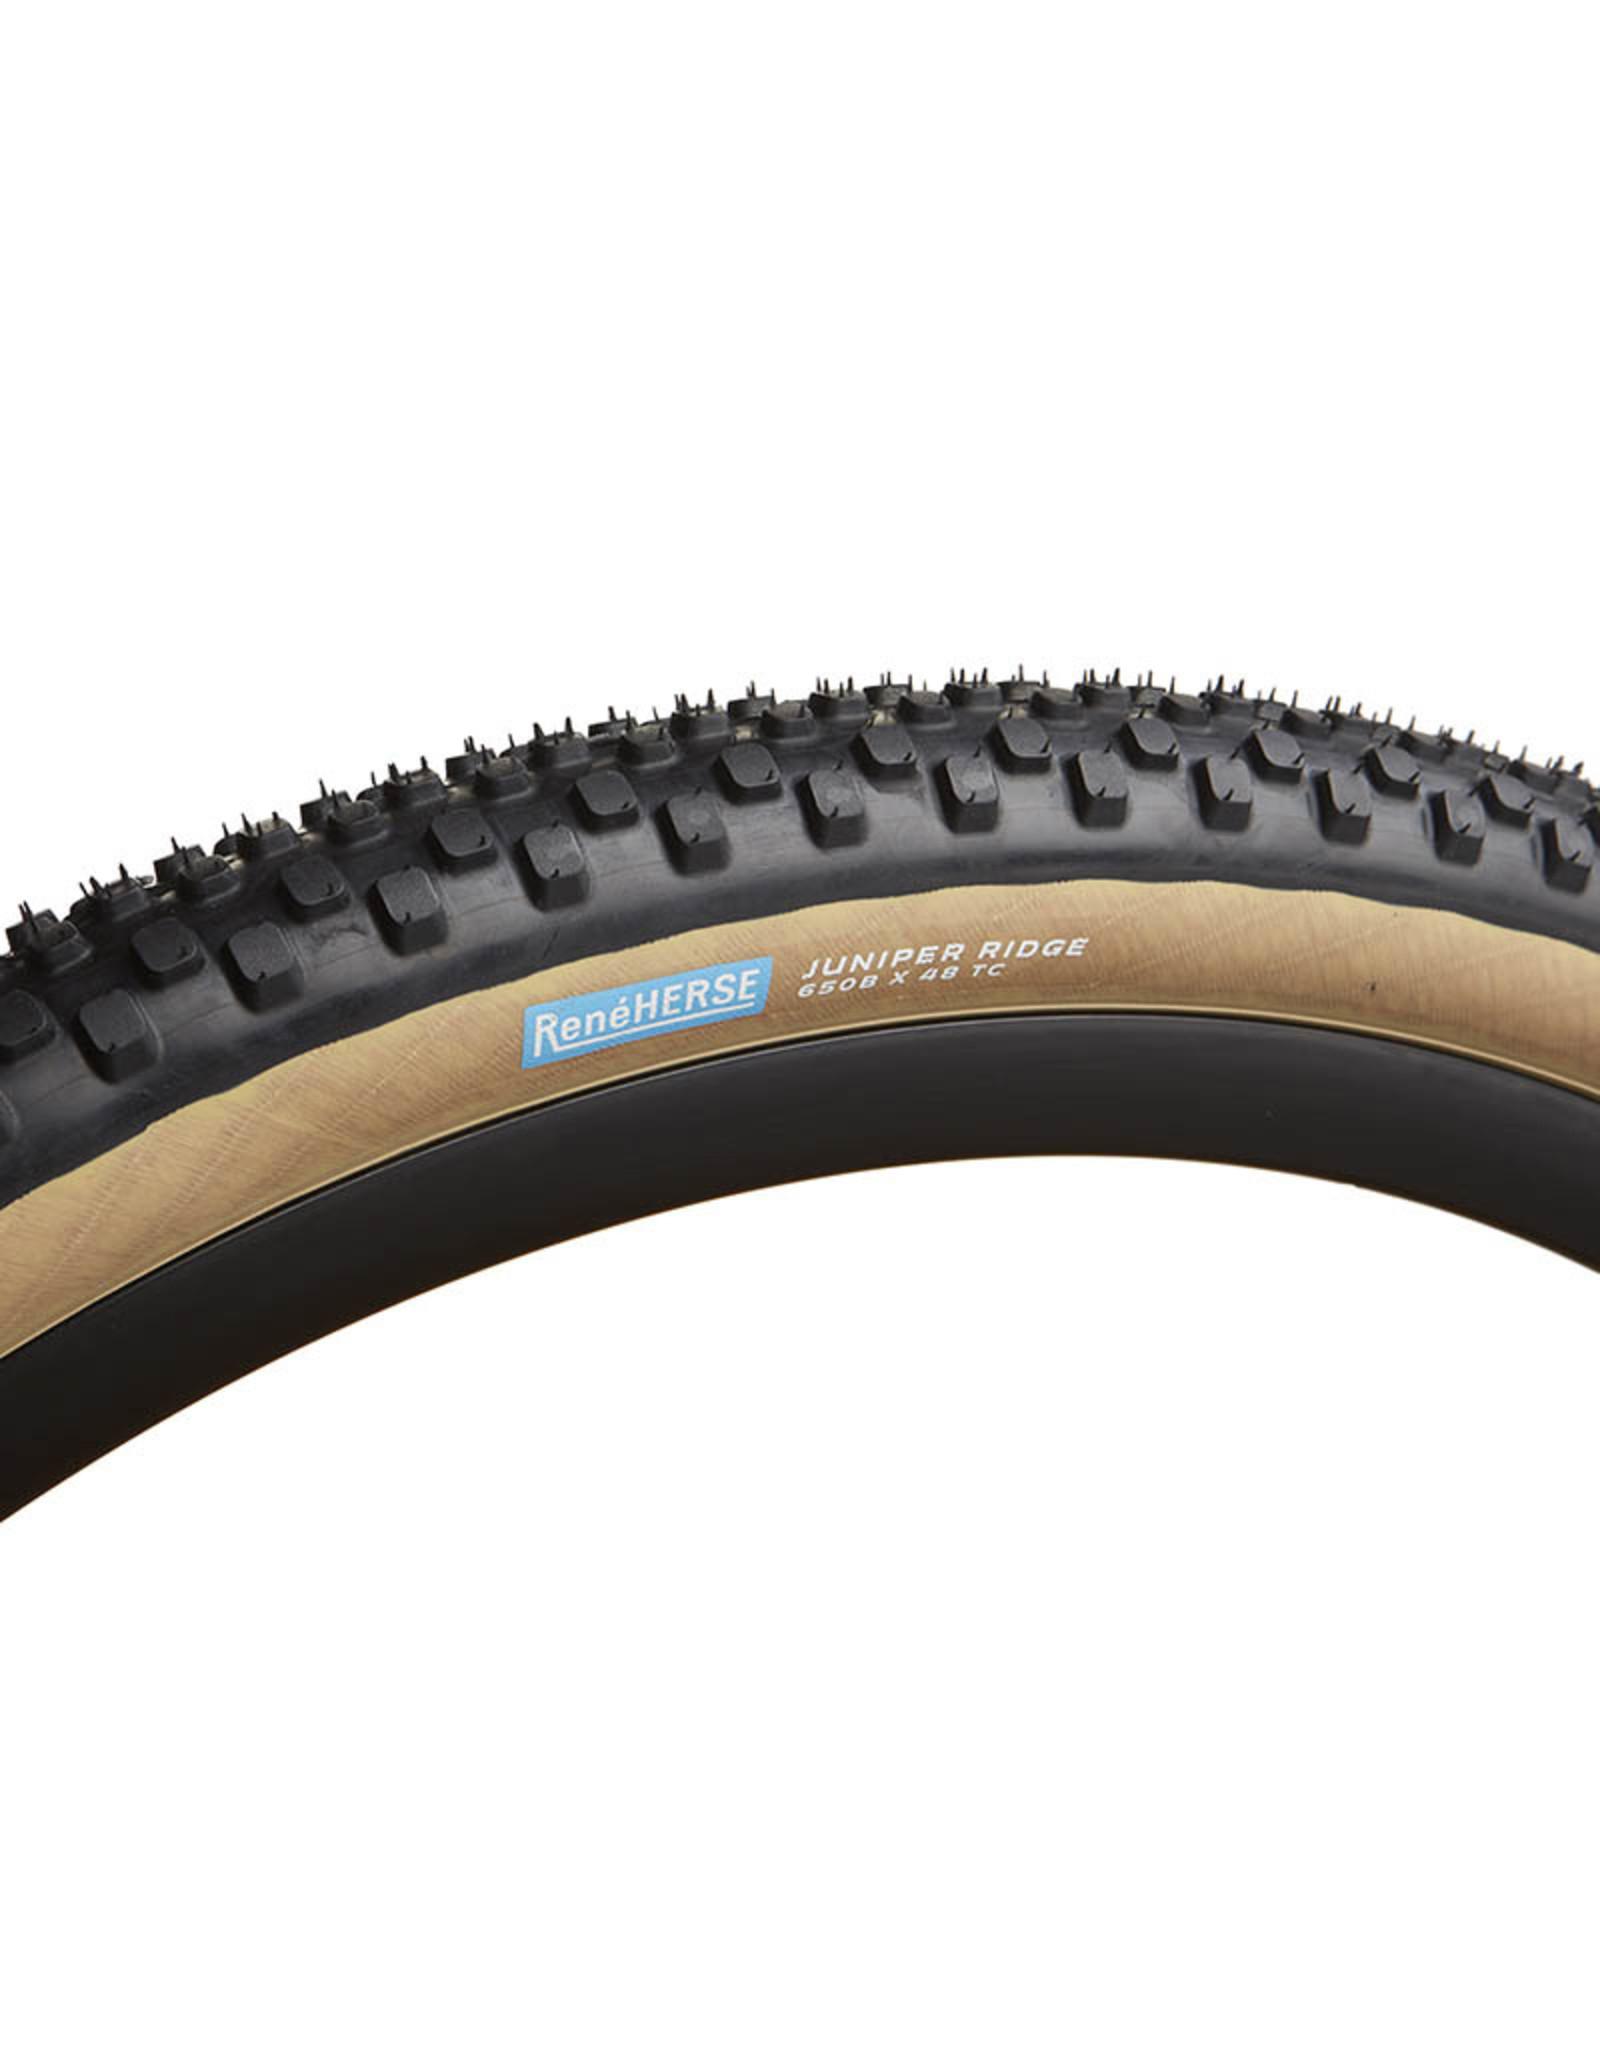 Rene Herse Juniper Ridge Tire TC casing tan 650B x 48